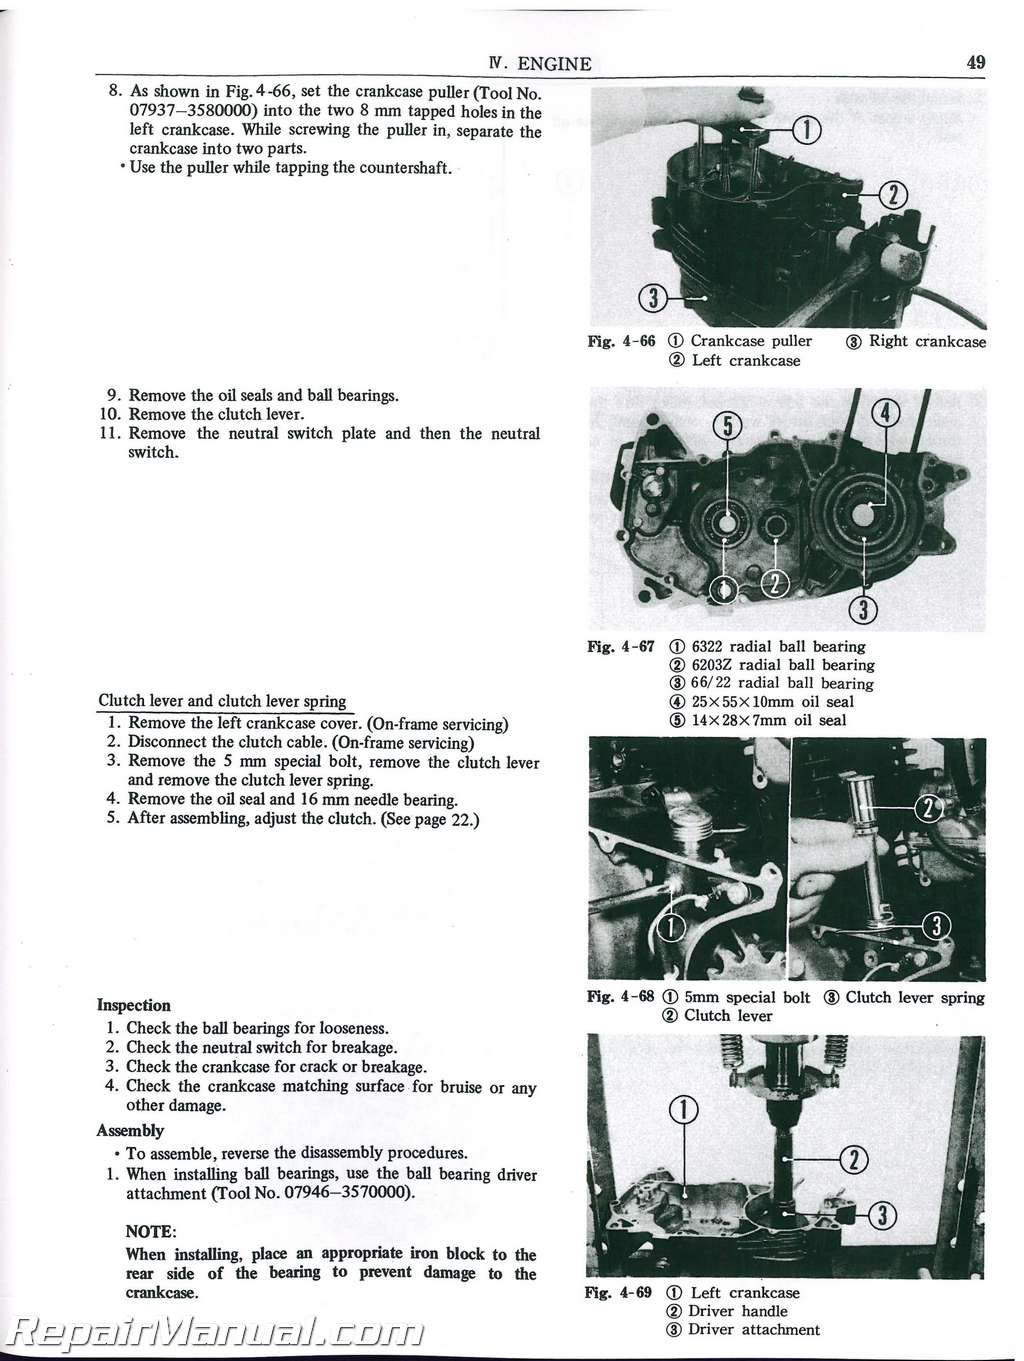 1973 1974 1975 1976 honda mt250 elsinore motorcycle service manual Honda Mt250 Wiring Diagram honda mt250 elsinore 1975 k1 usa parts